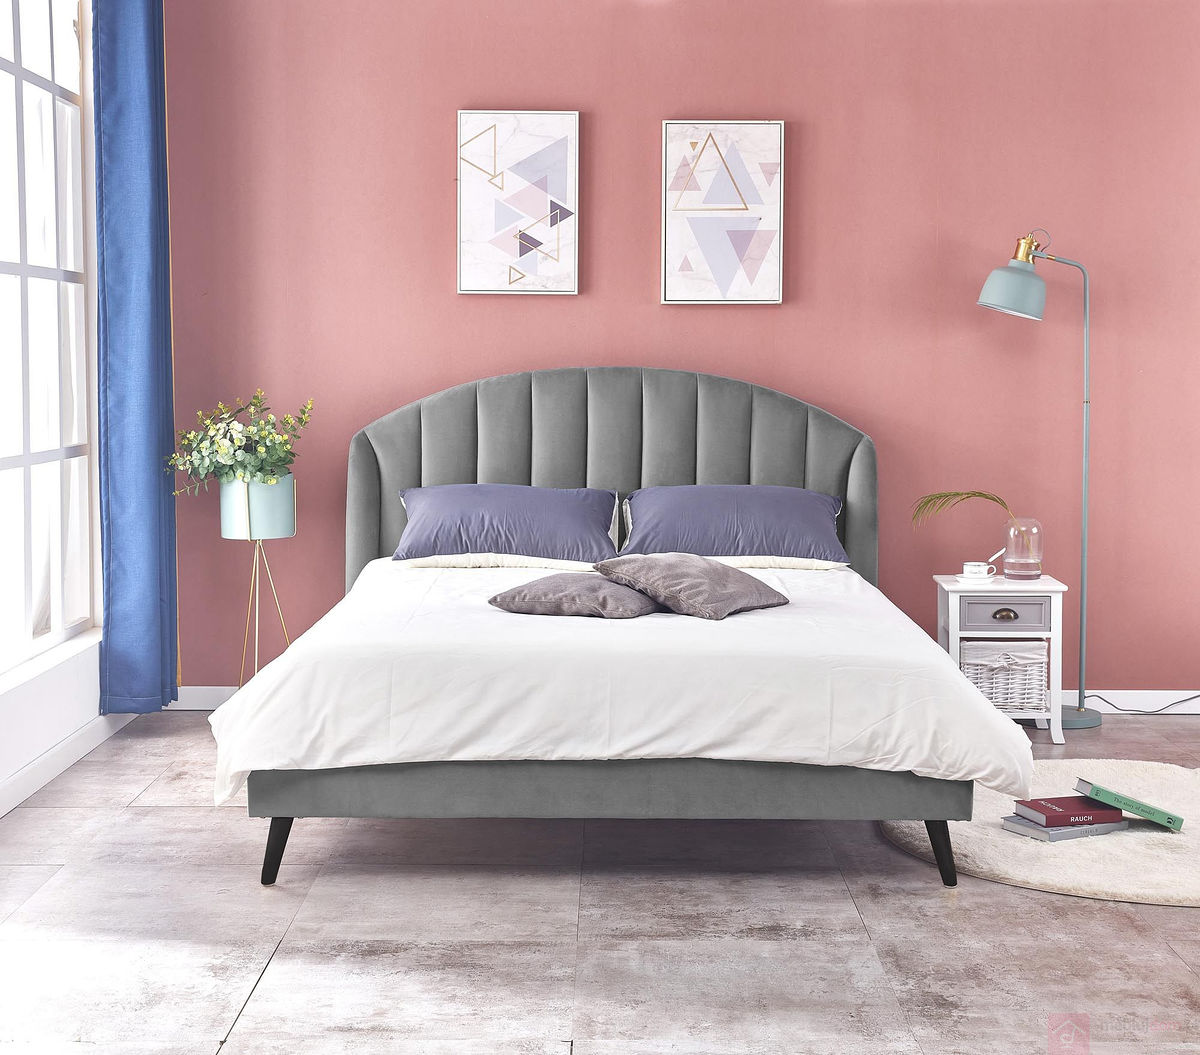 Łóżko YOVELLA 160 Halmar przodem